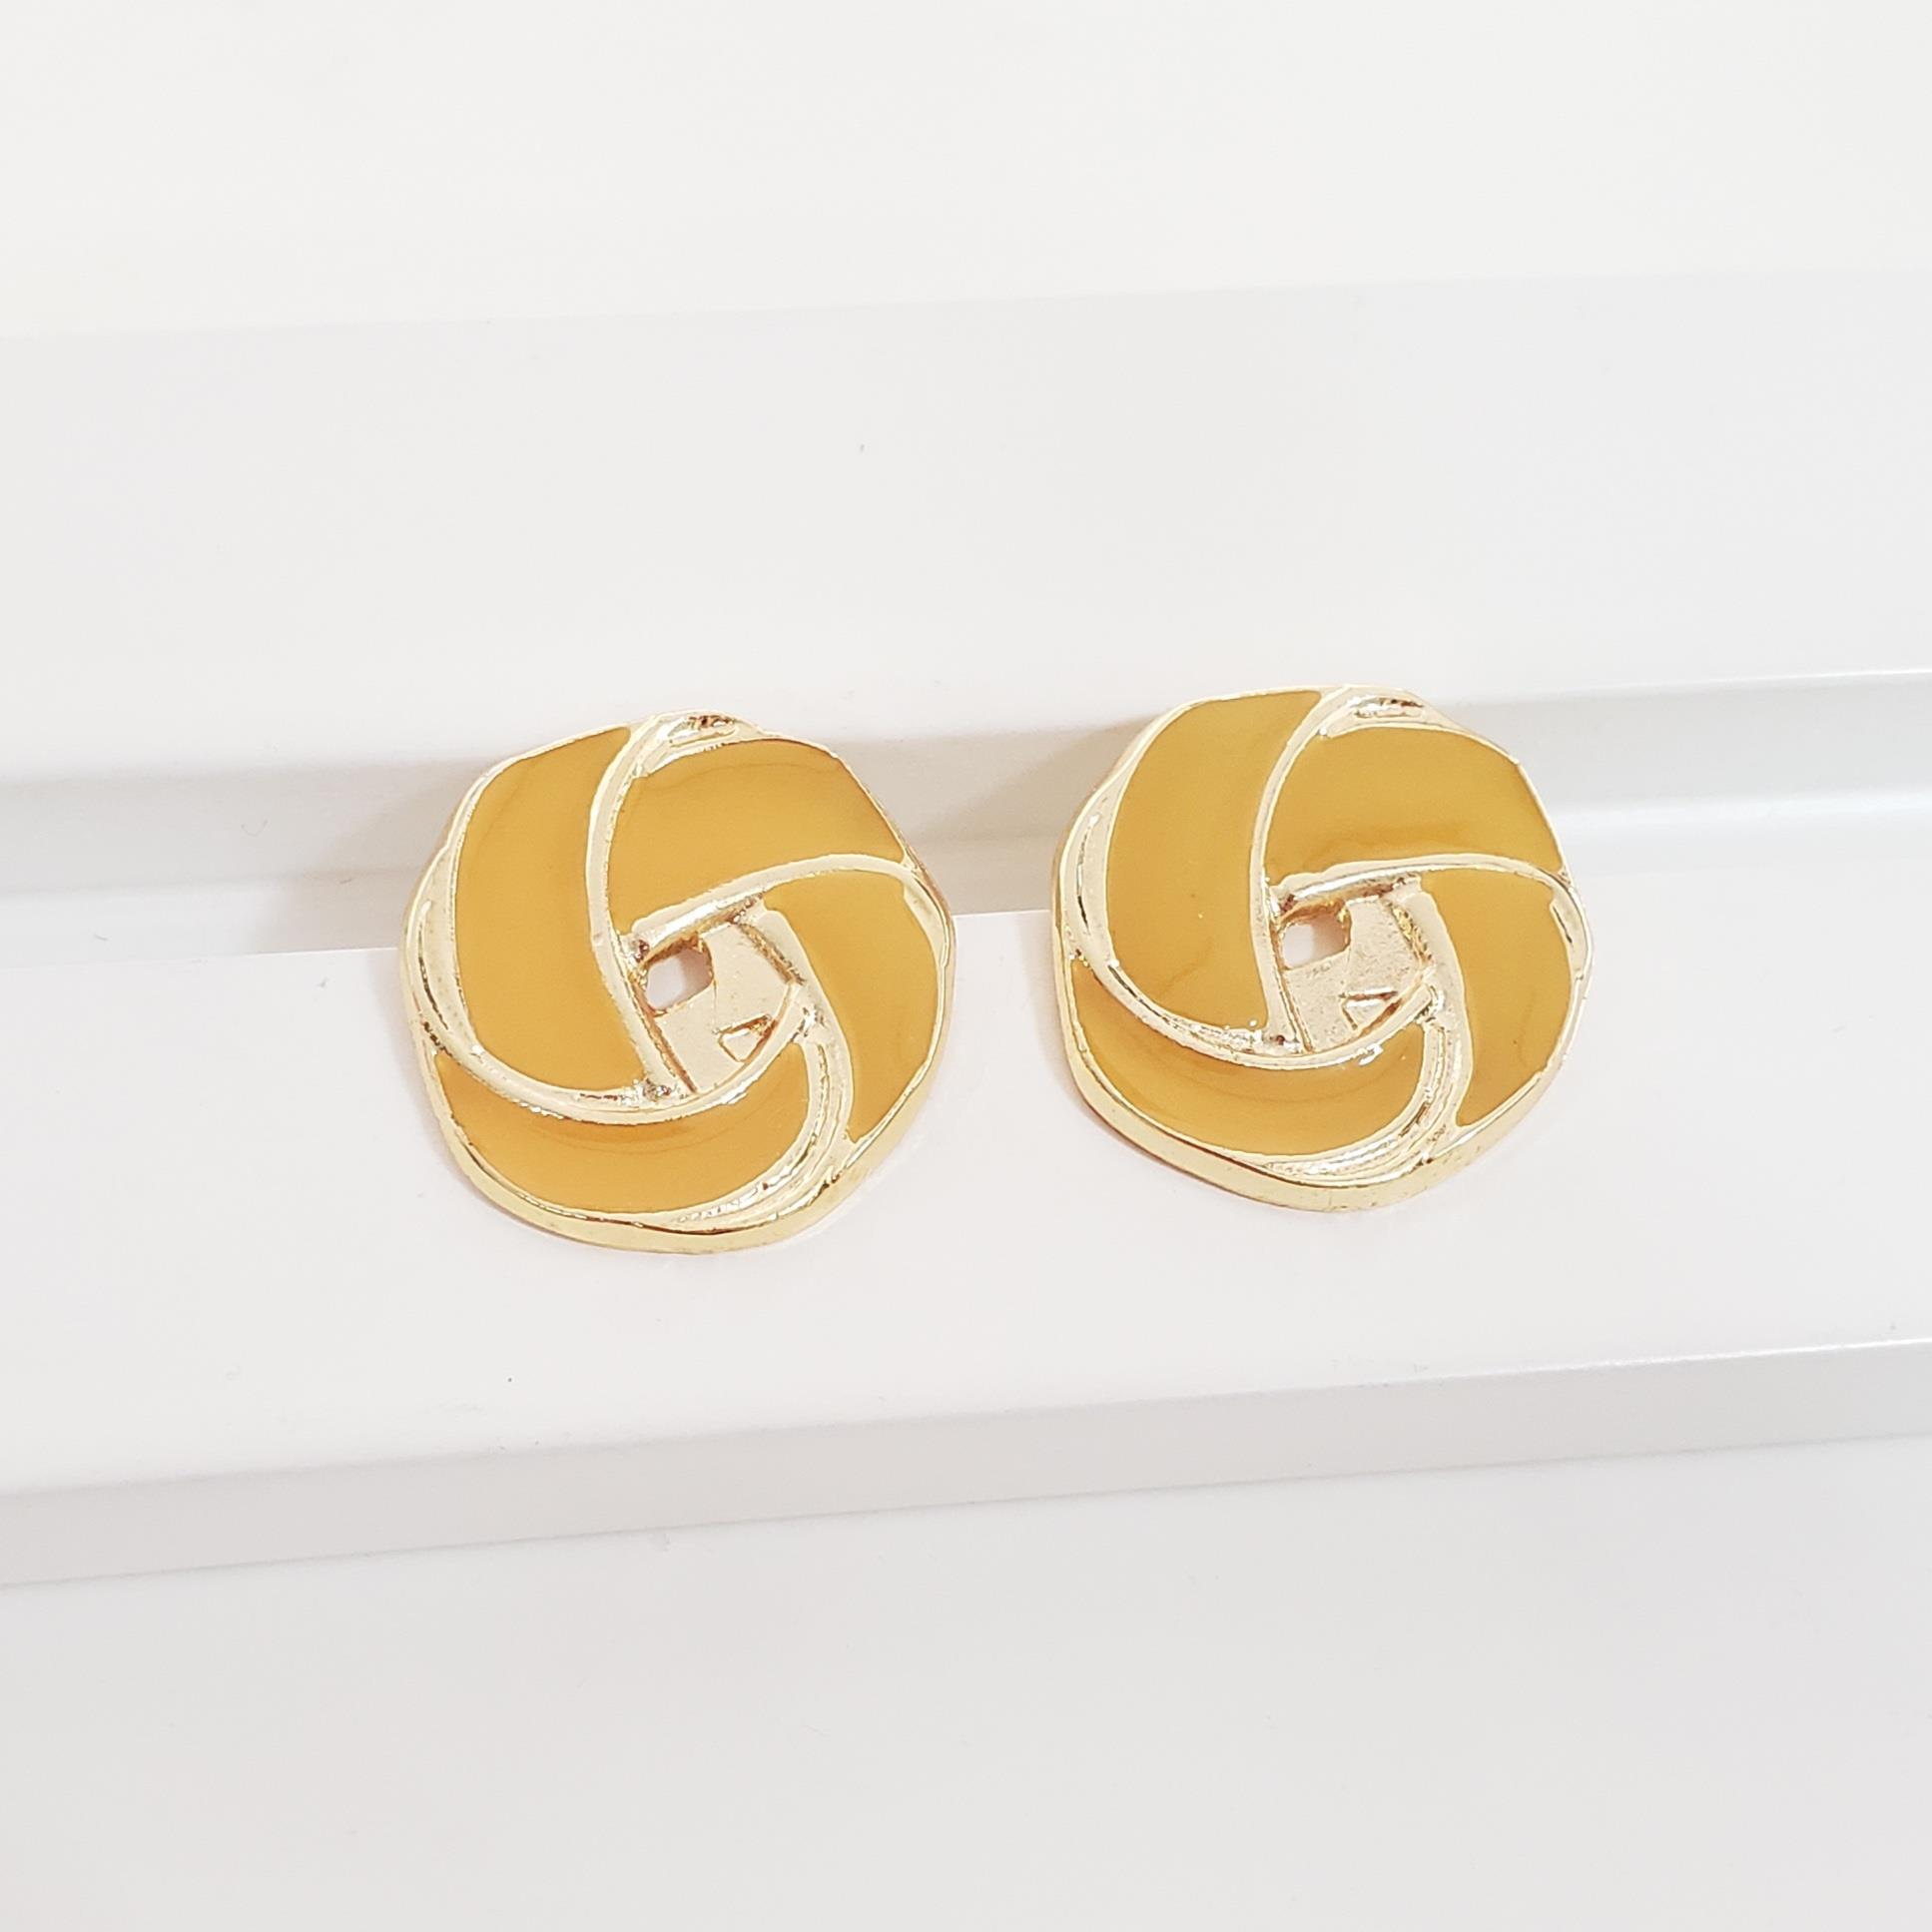 Brinco Botão Flor Achatada Esmaltado Amarelo no Banho Ouro 18k Semijoia